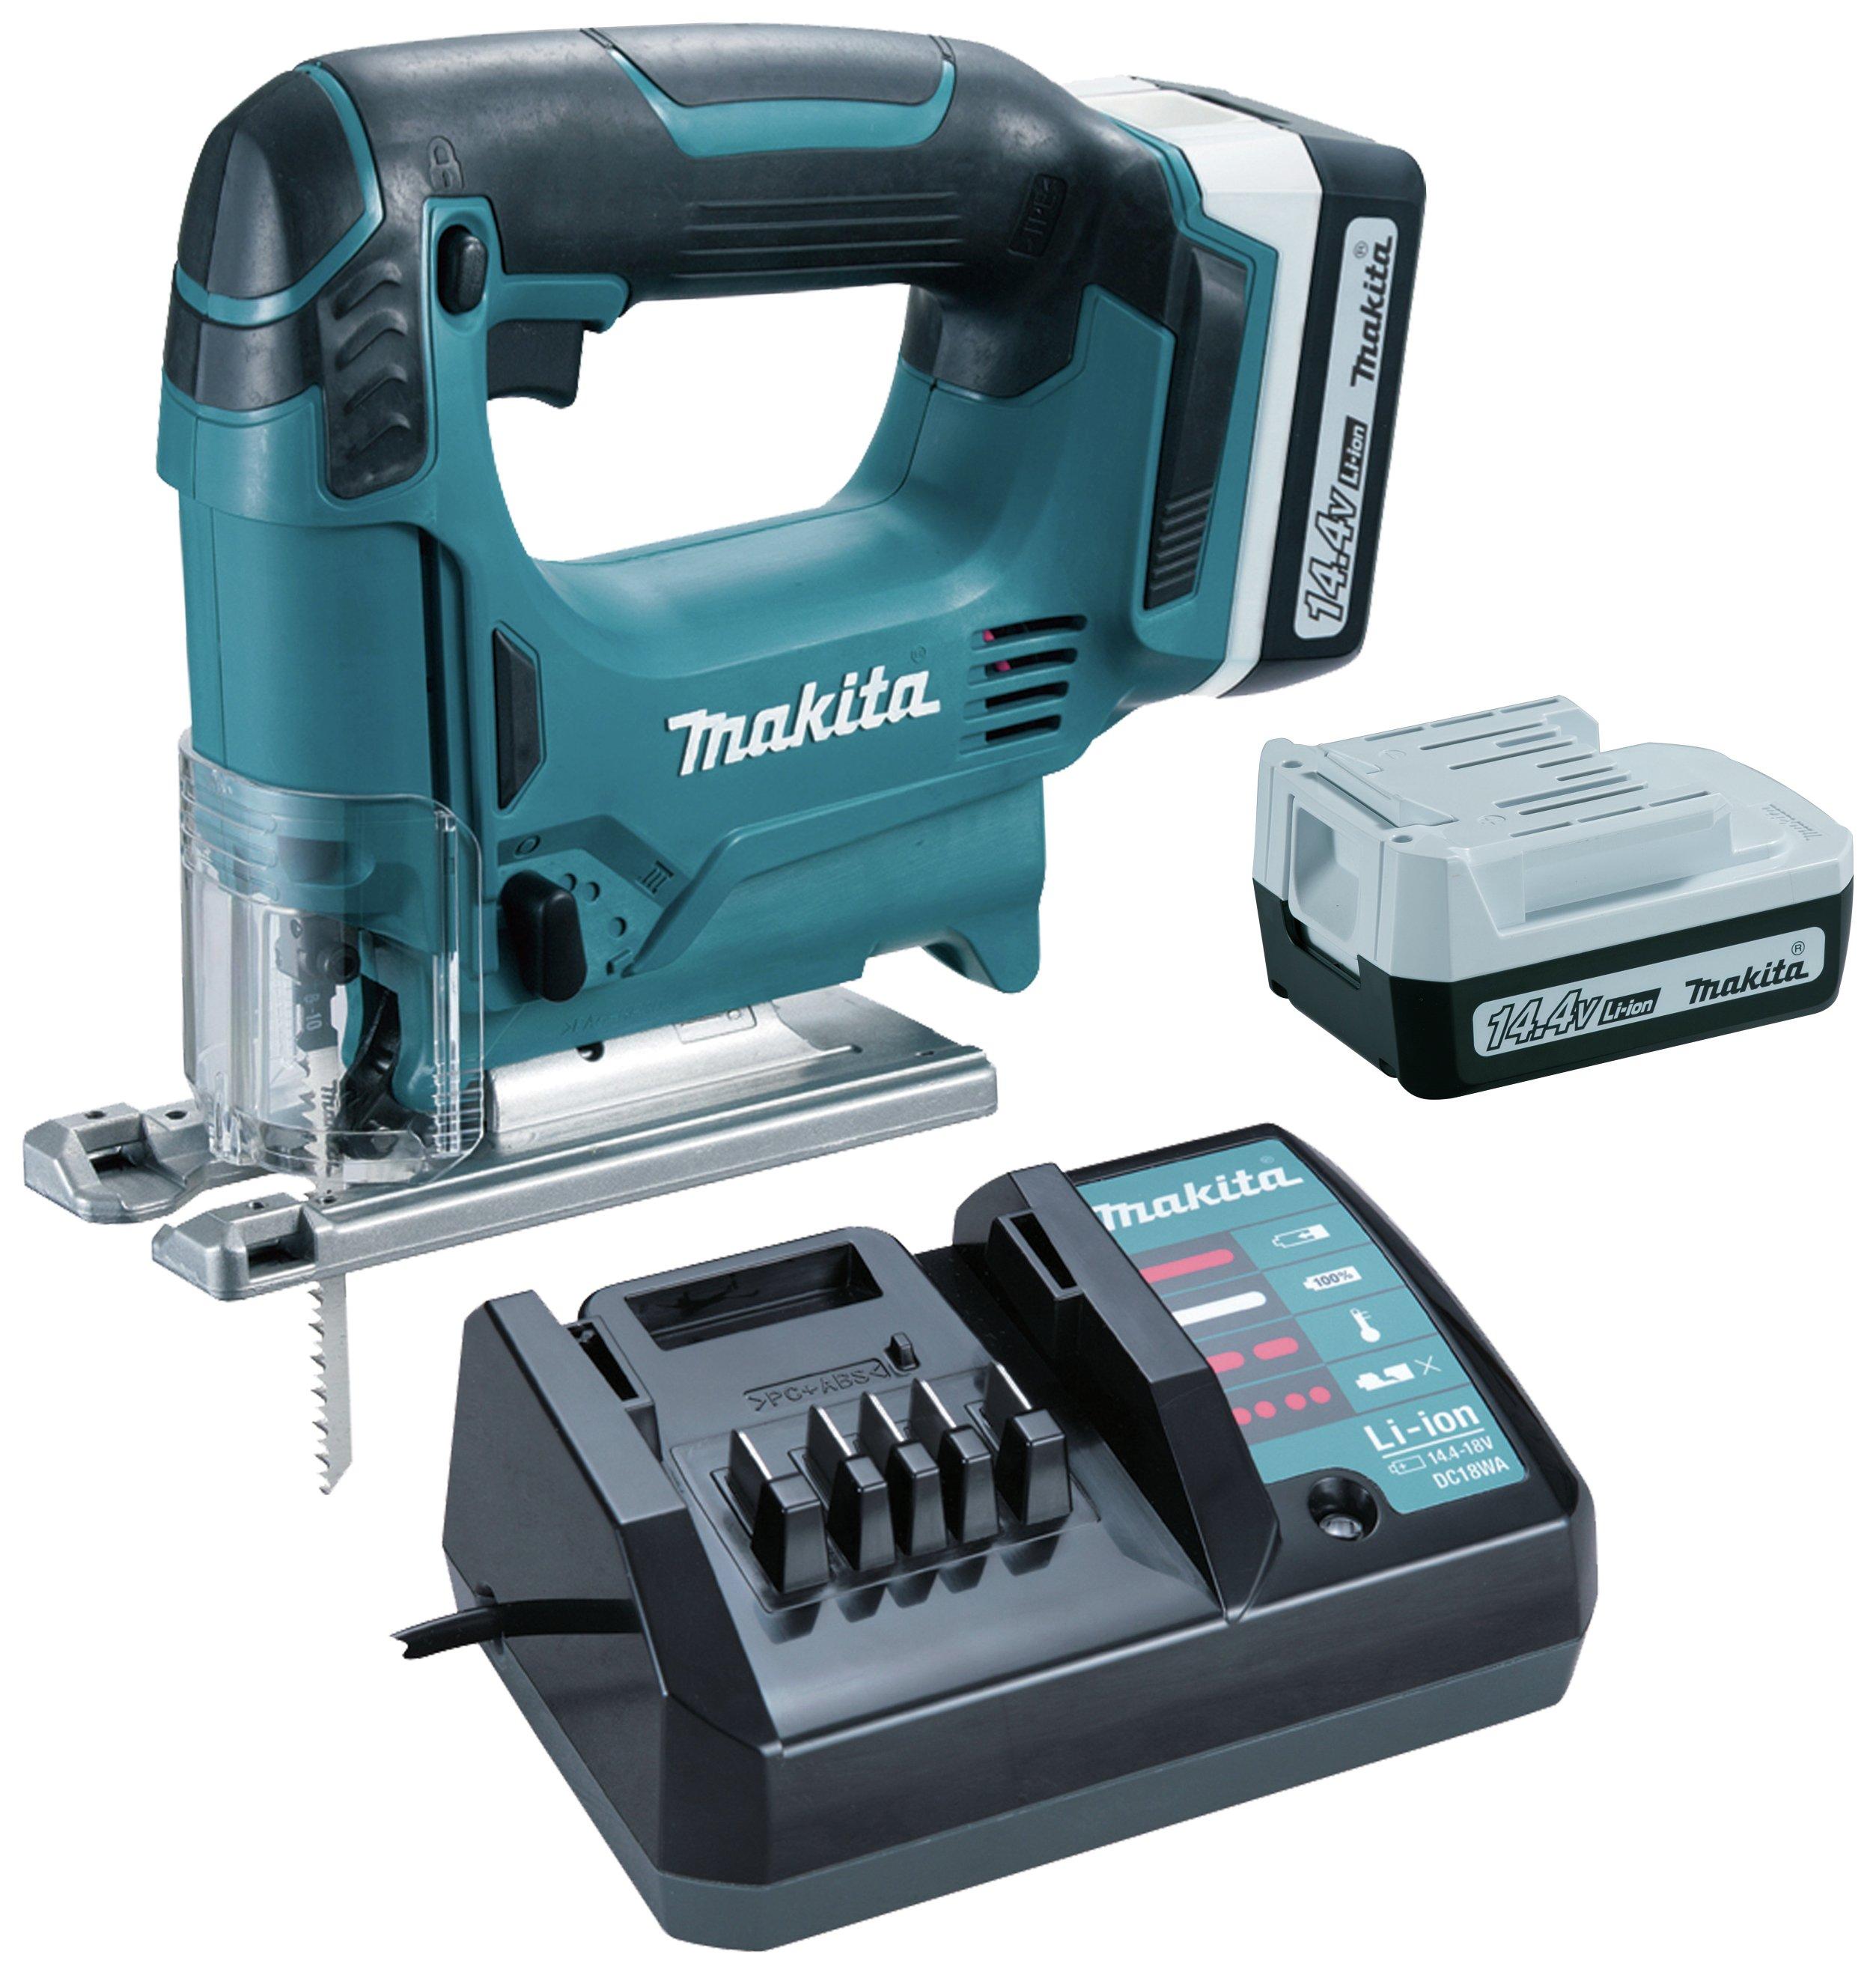 Makita - 144v Li-on Jigsaw with 2 Batteries lowest price